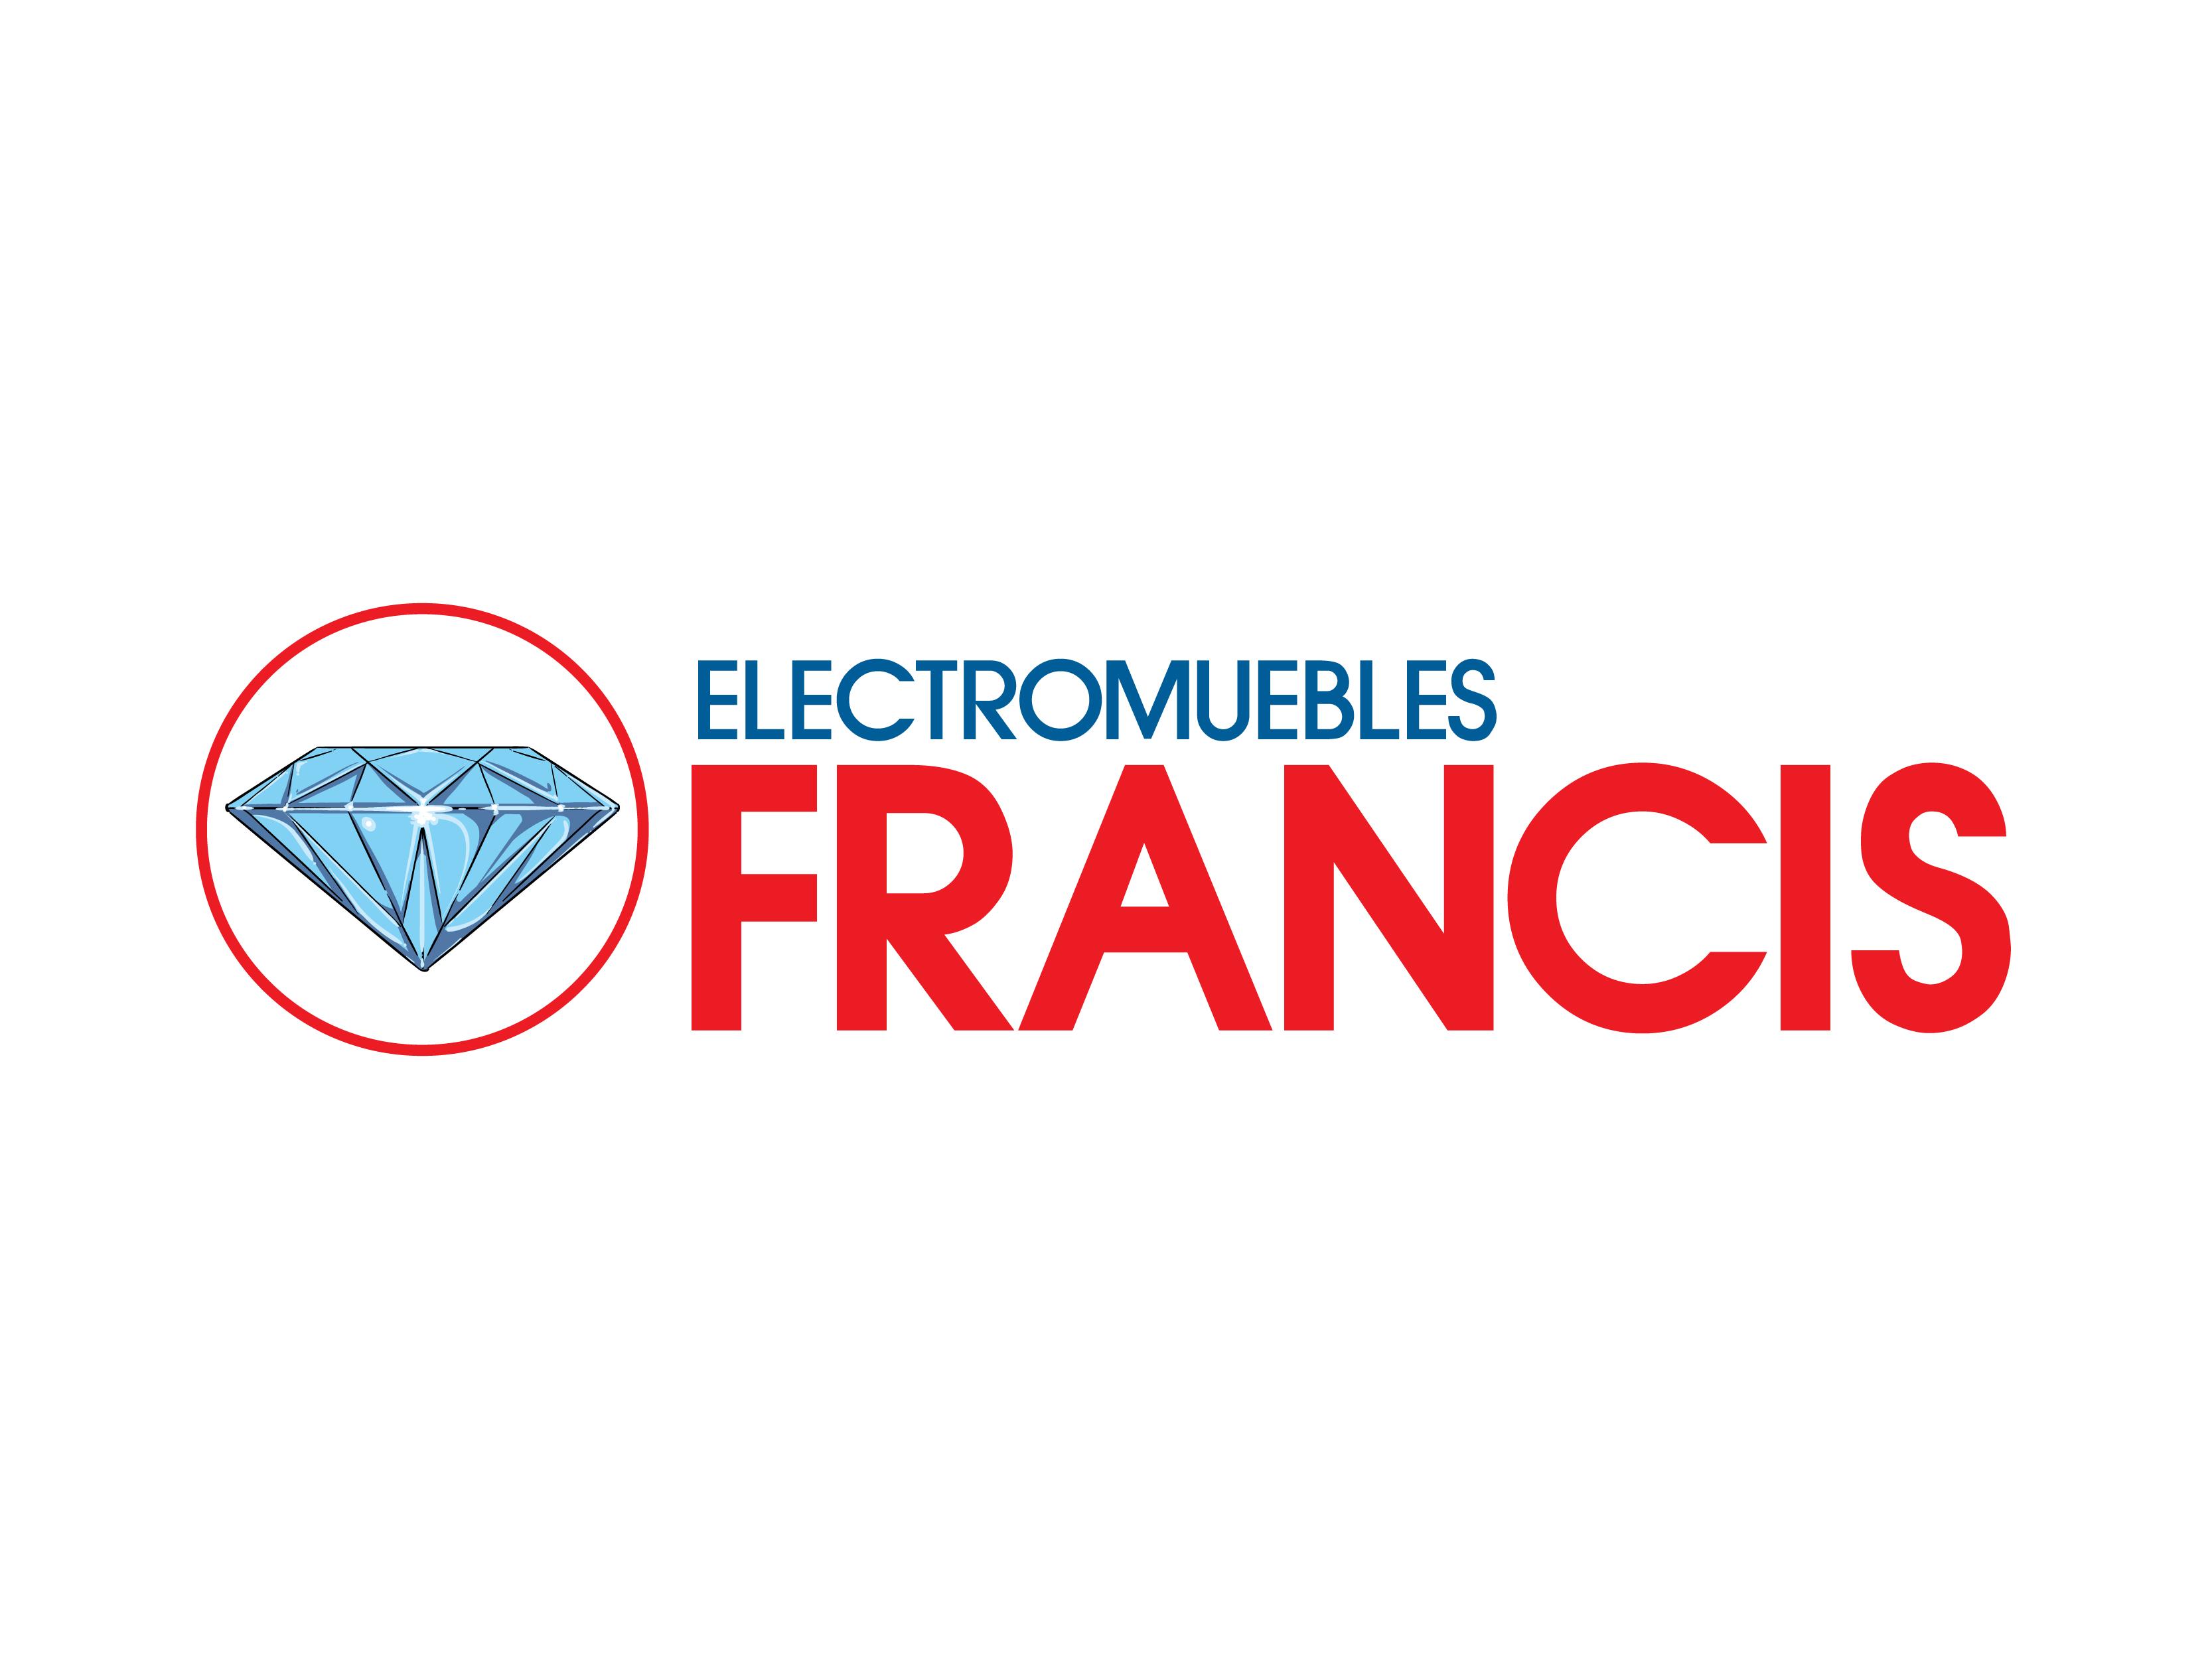 electromuebles francis logo